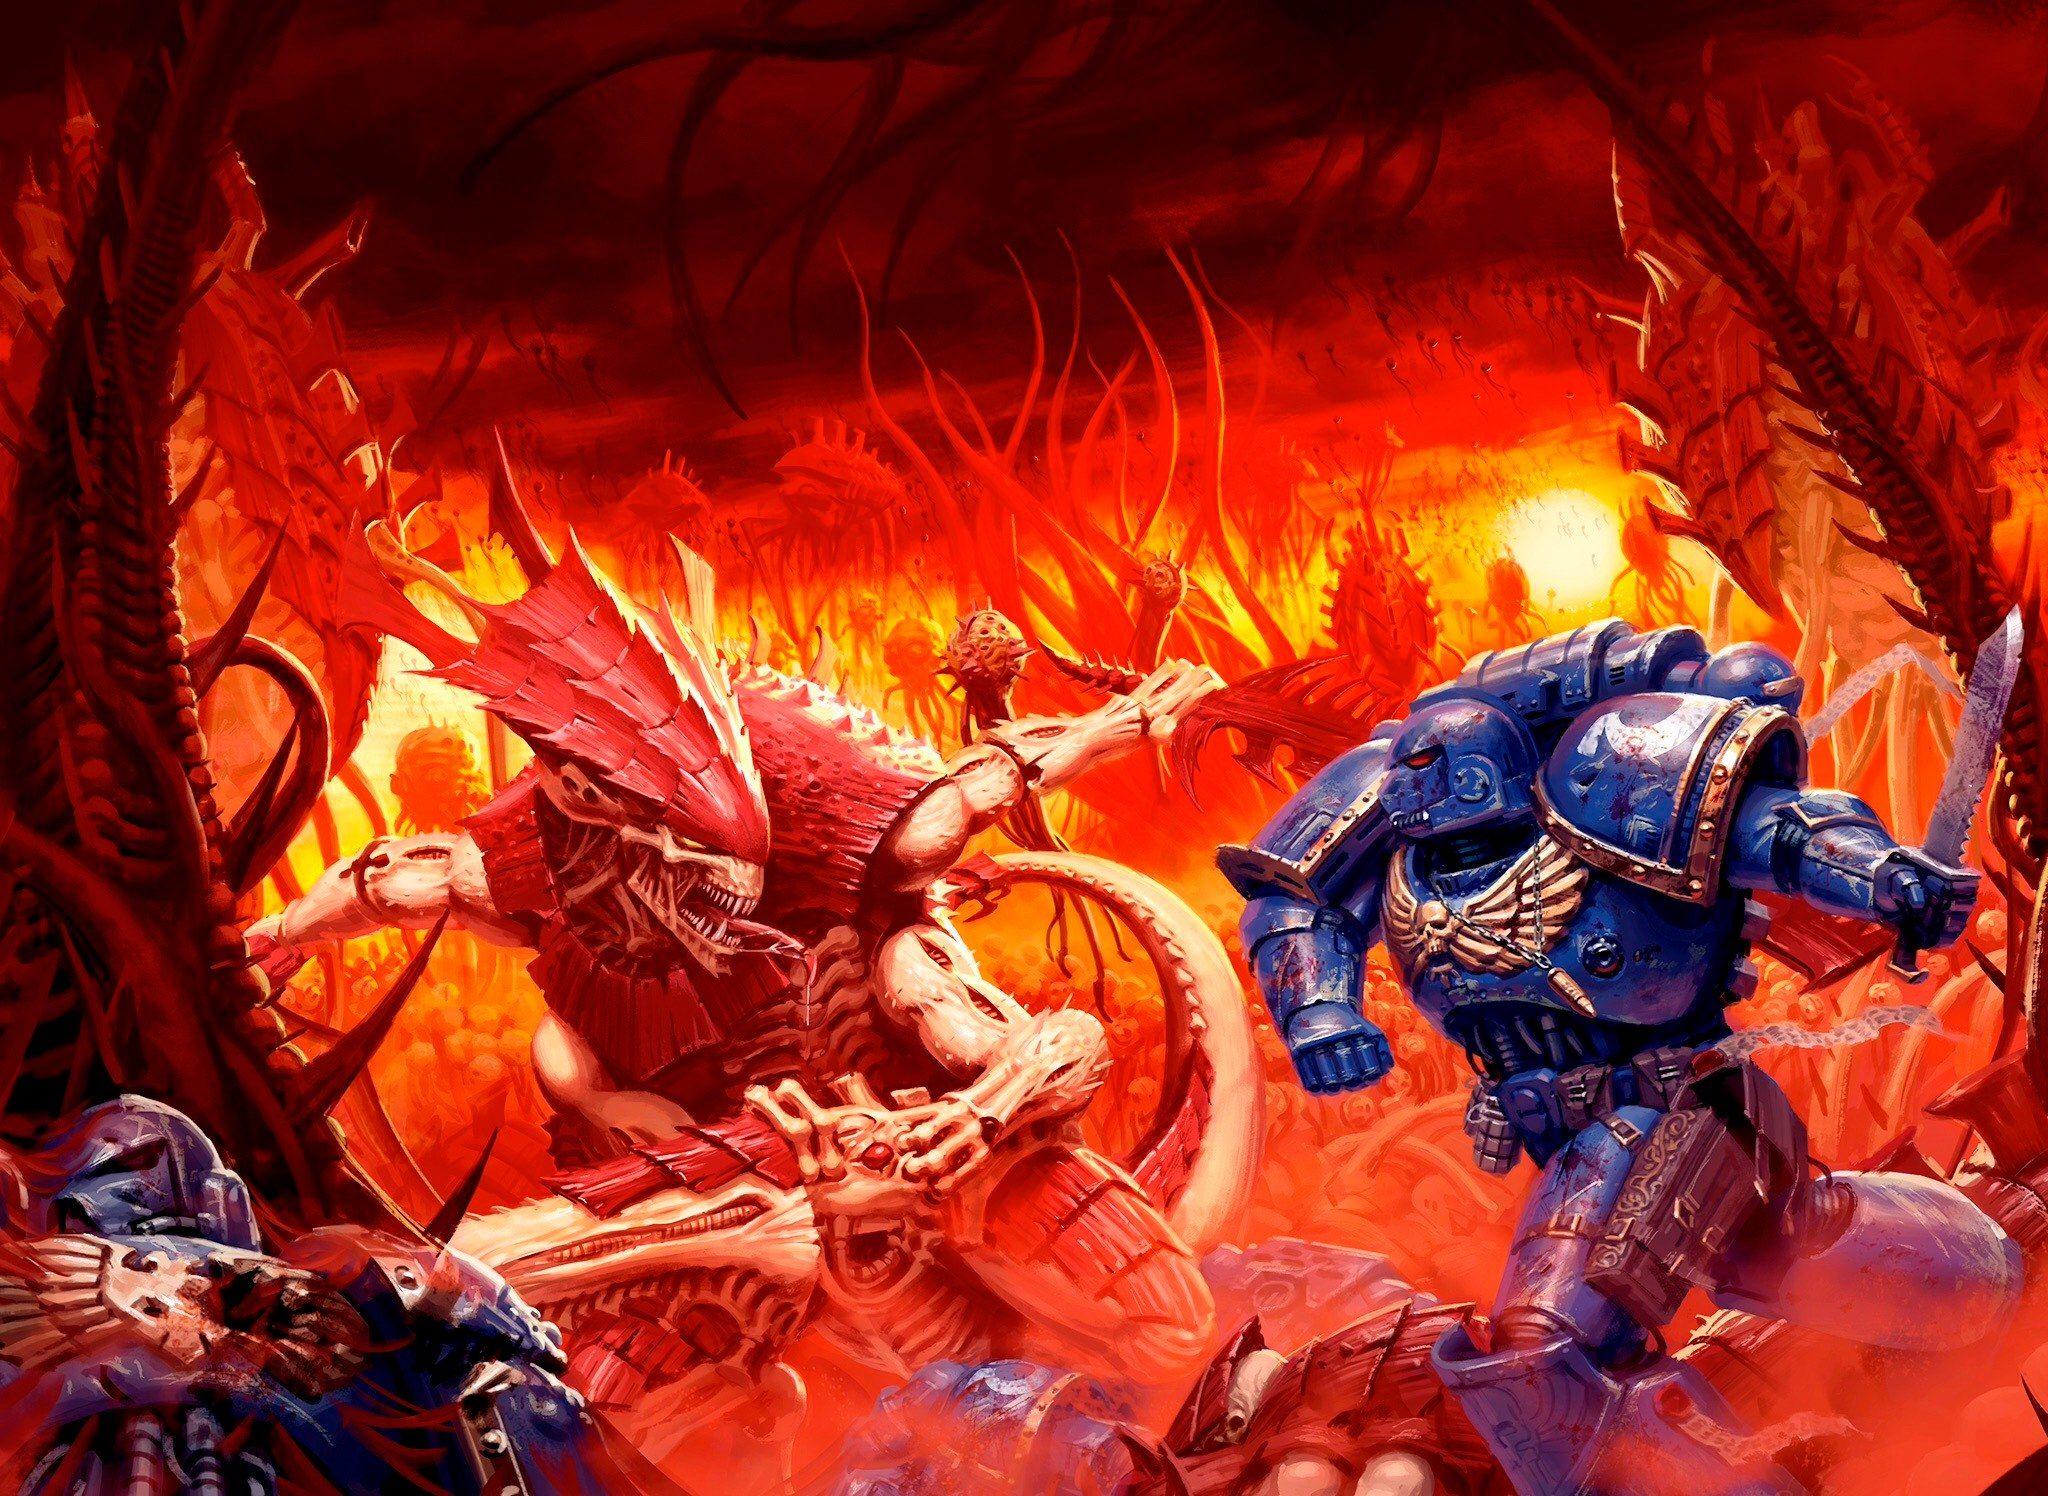 40k 30k Imperial Wallpapers Album On Imgur Warhammer 40 000 Tumblr Figurine